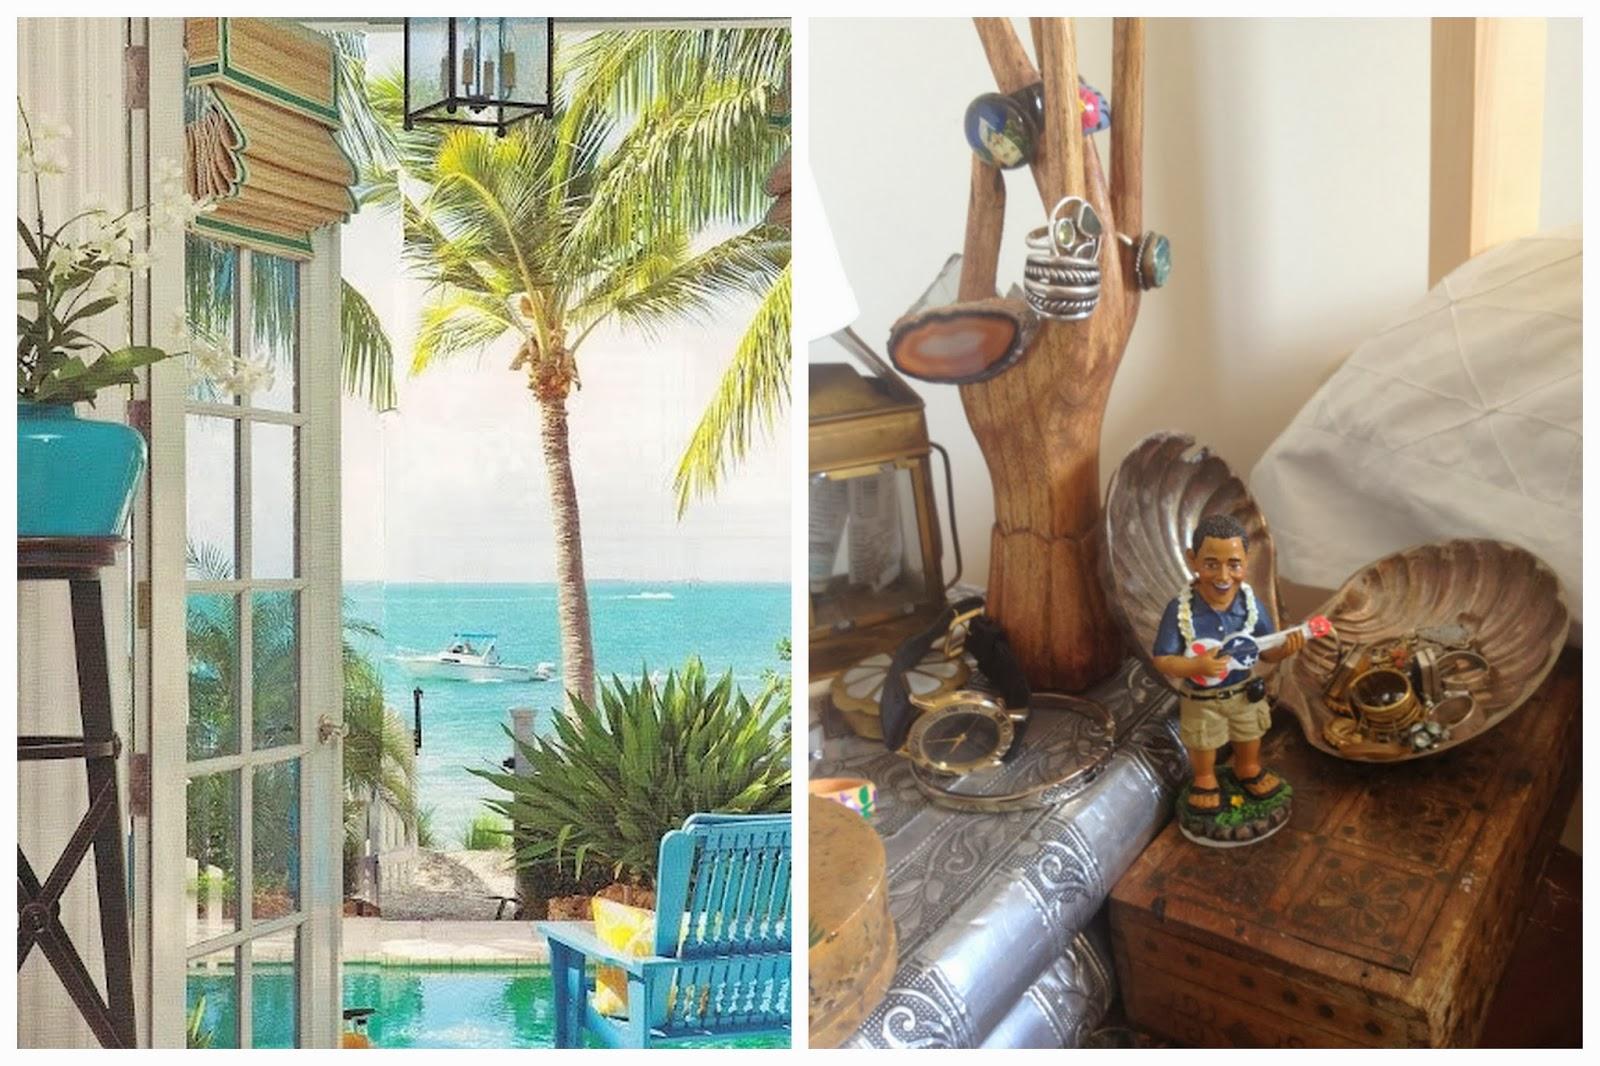 bikini,atoll,mood,déco,iles,island style,island living,tropical,coquillages,rotin,surf,hawaii